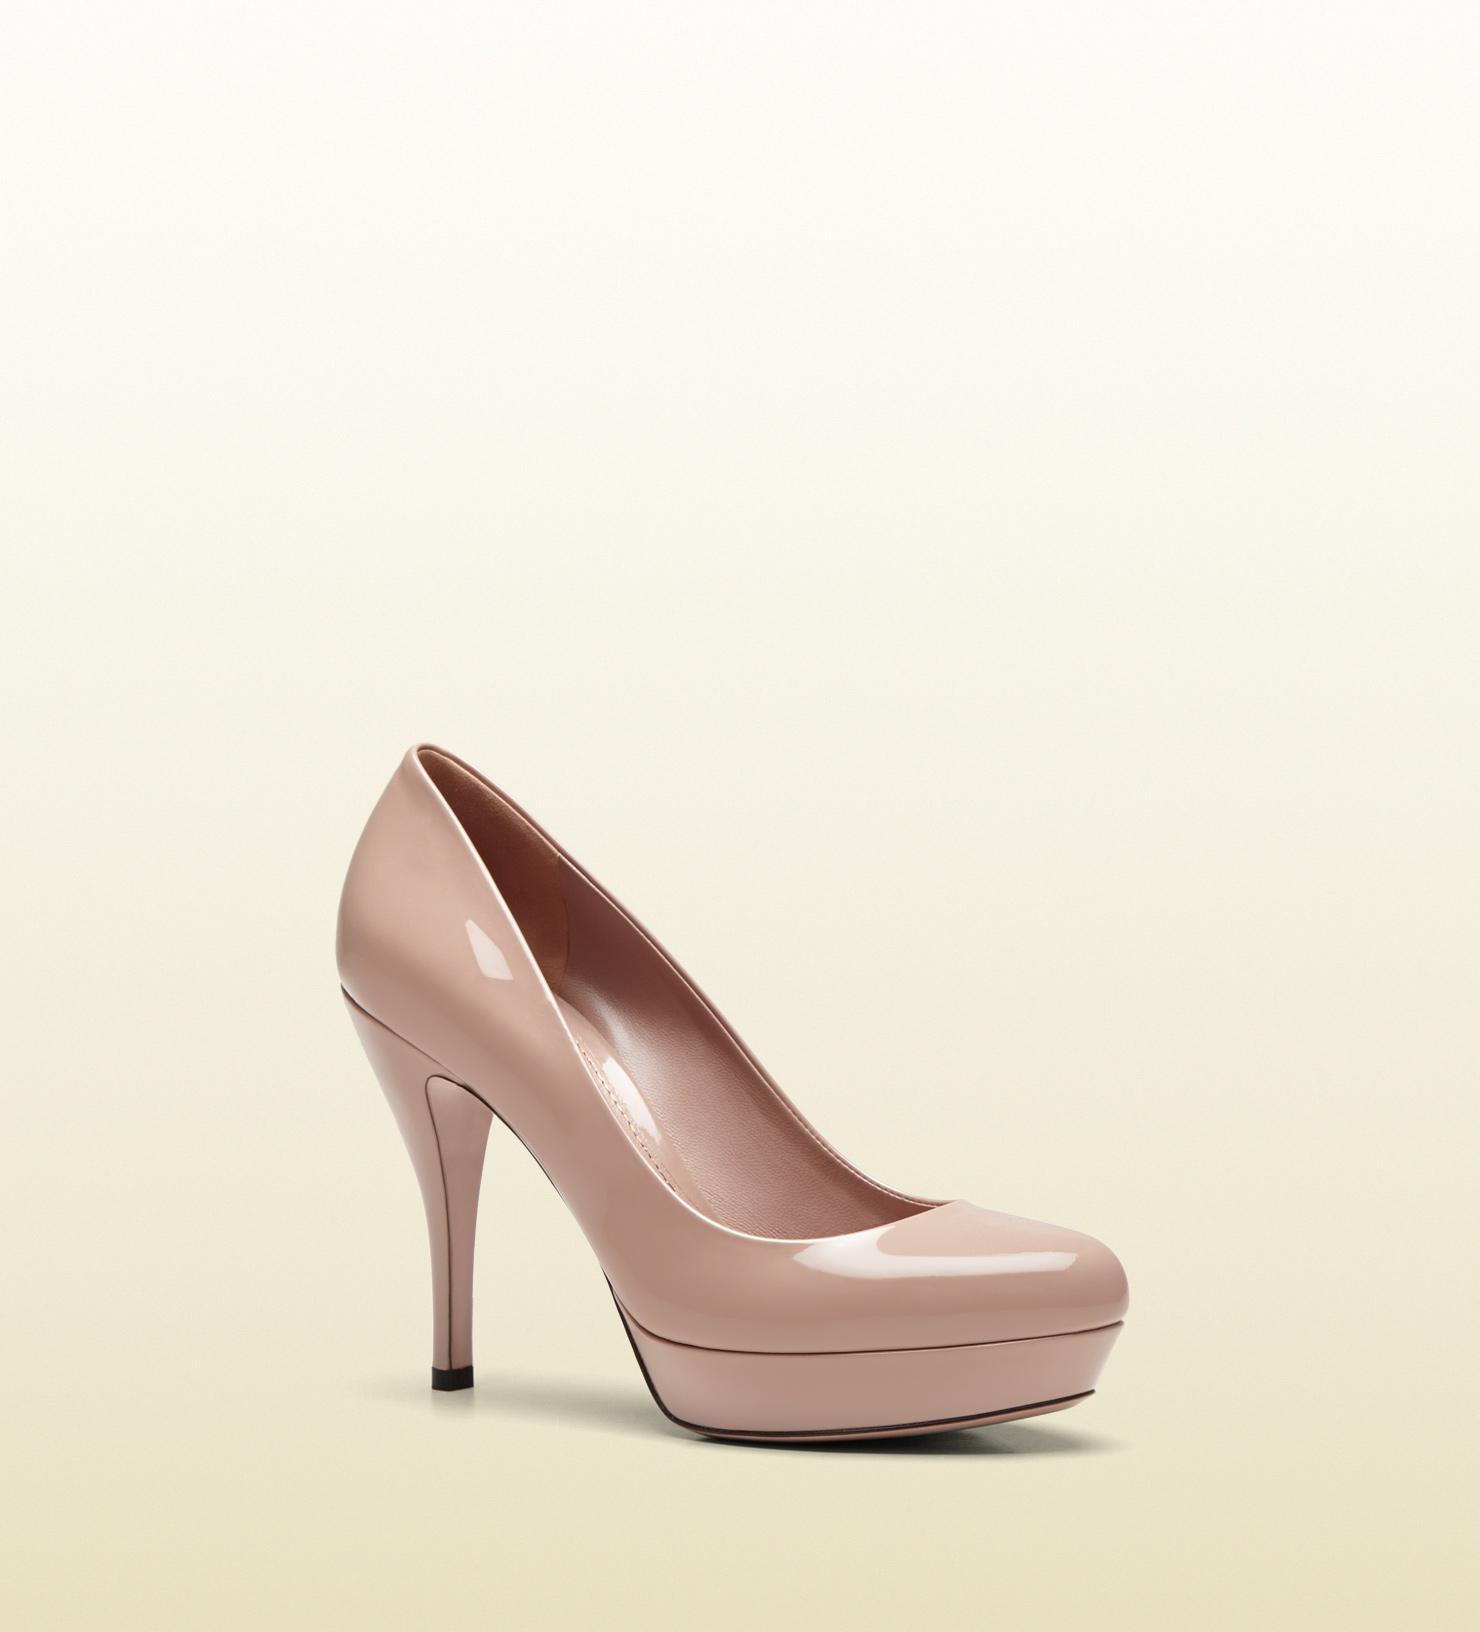 Lyst Gucci Light Pink Patent Leather Midheel Platform